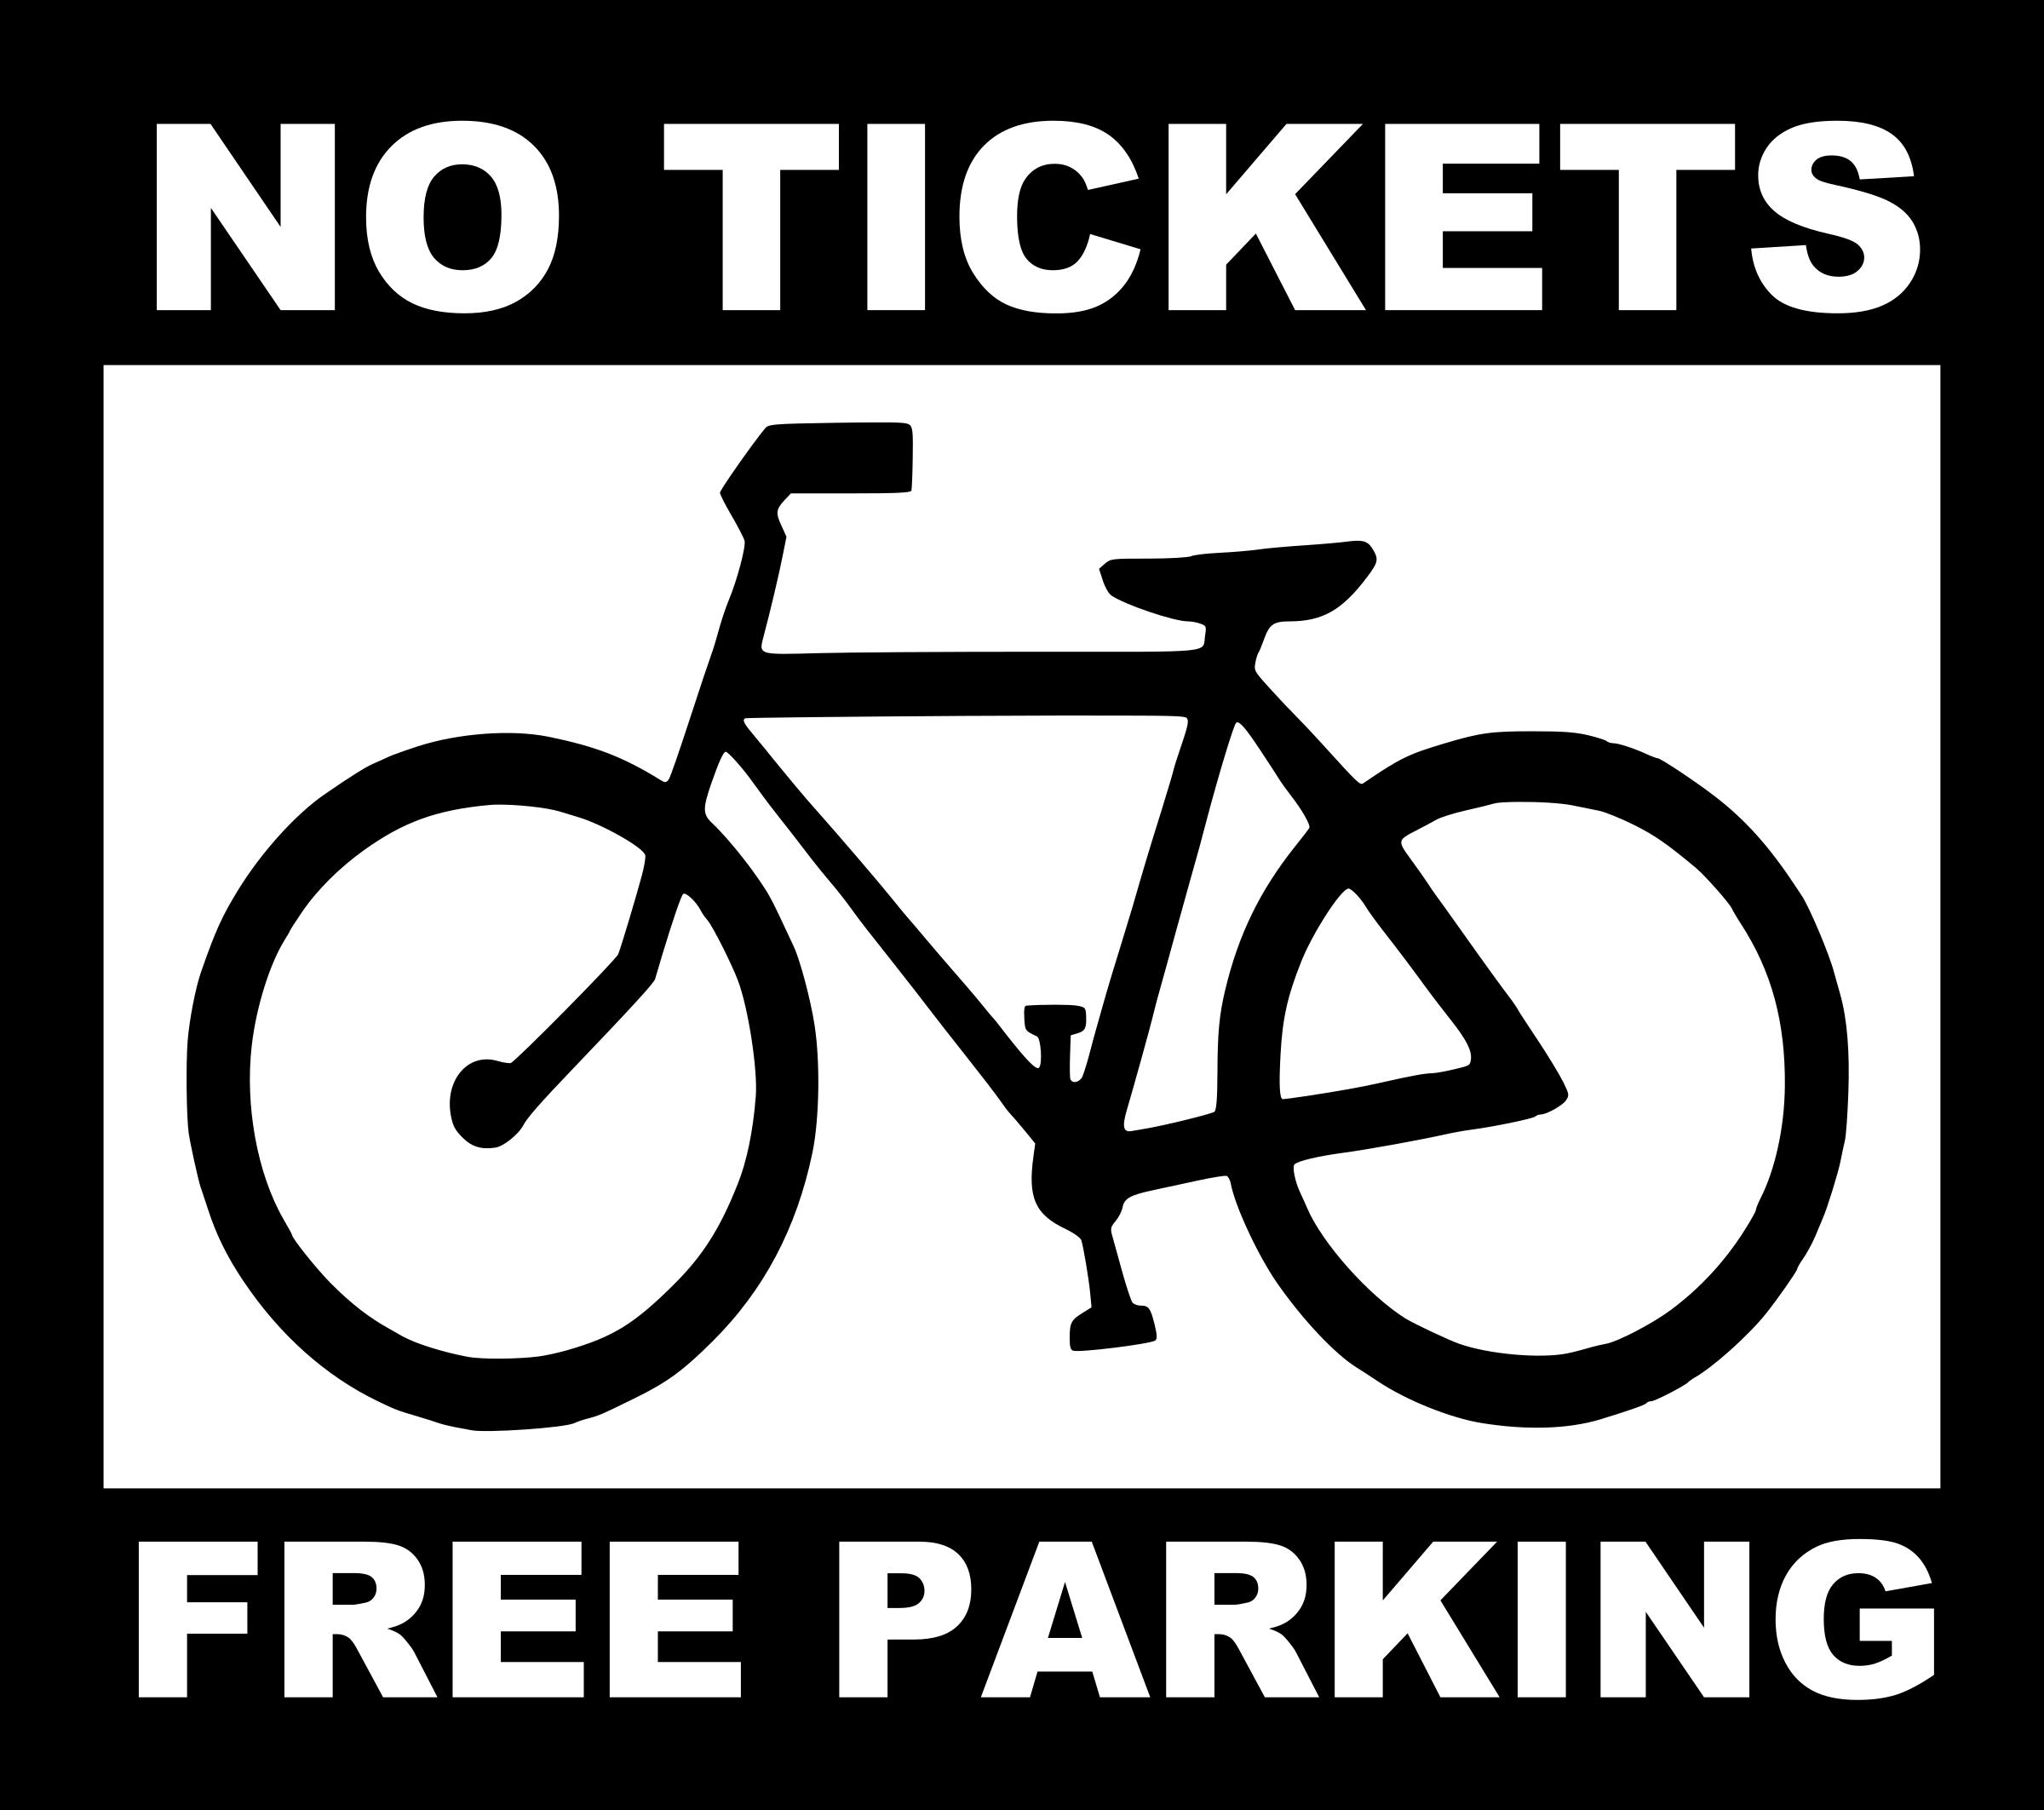 Free parking photo